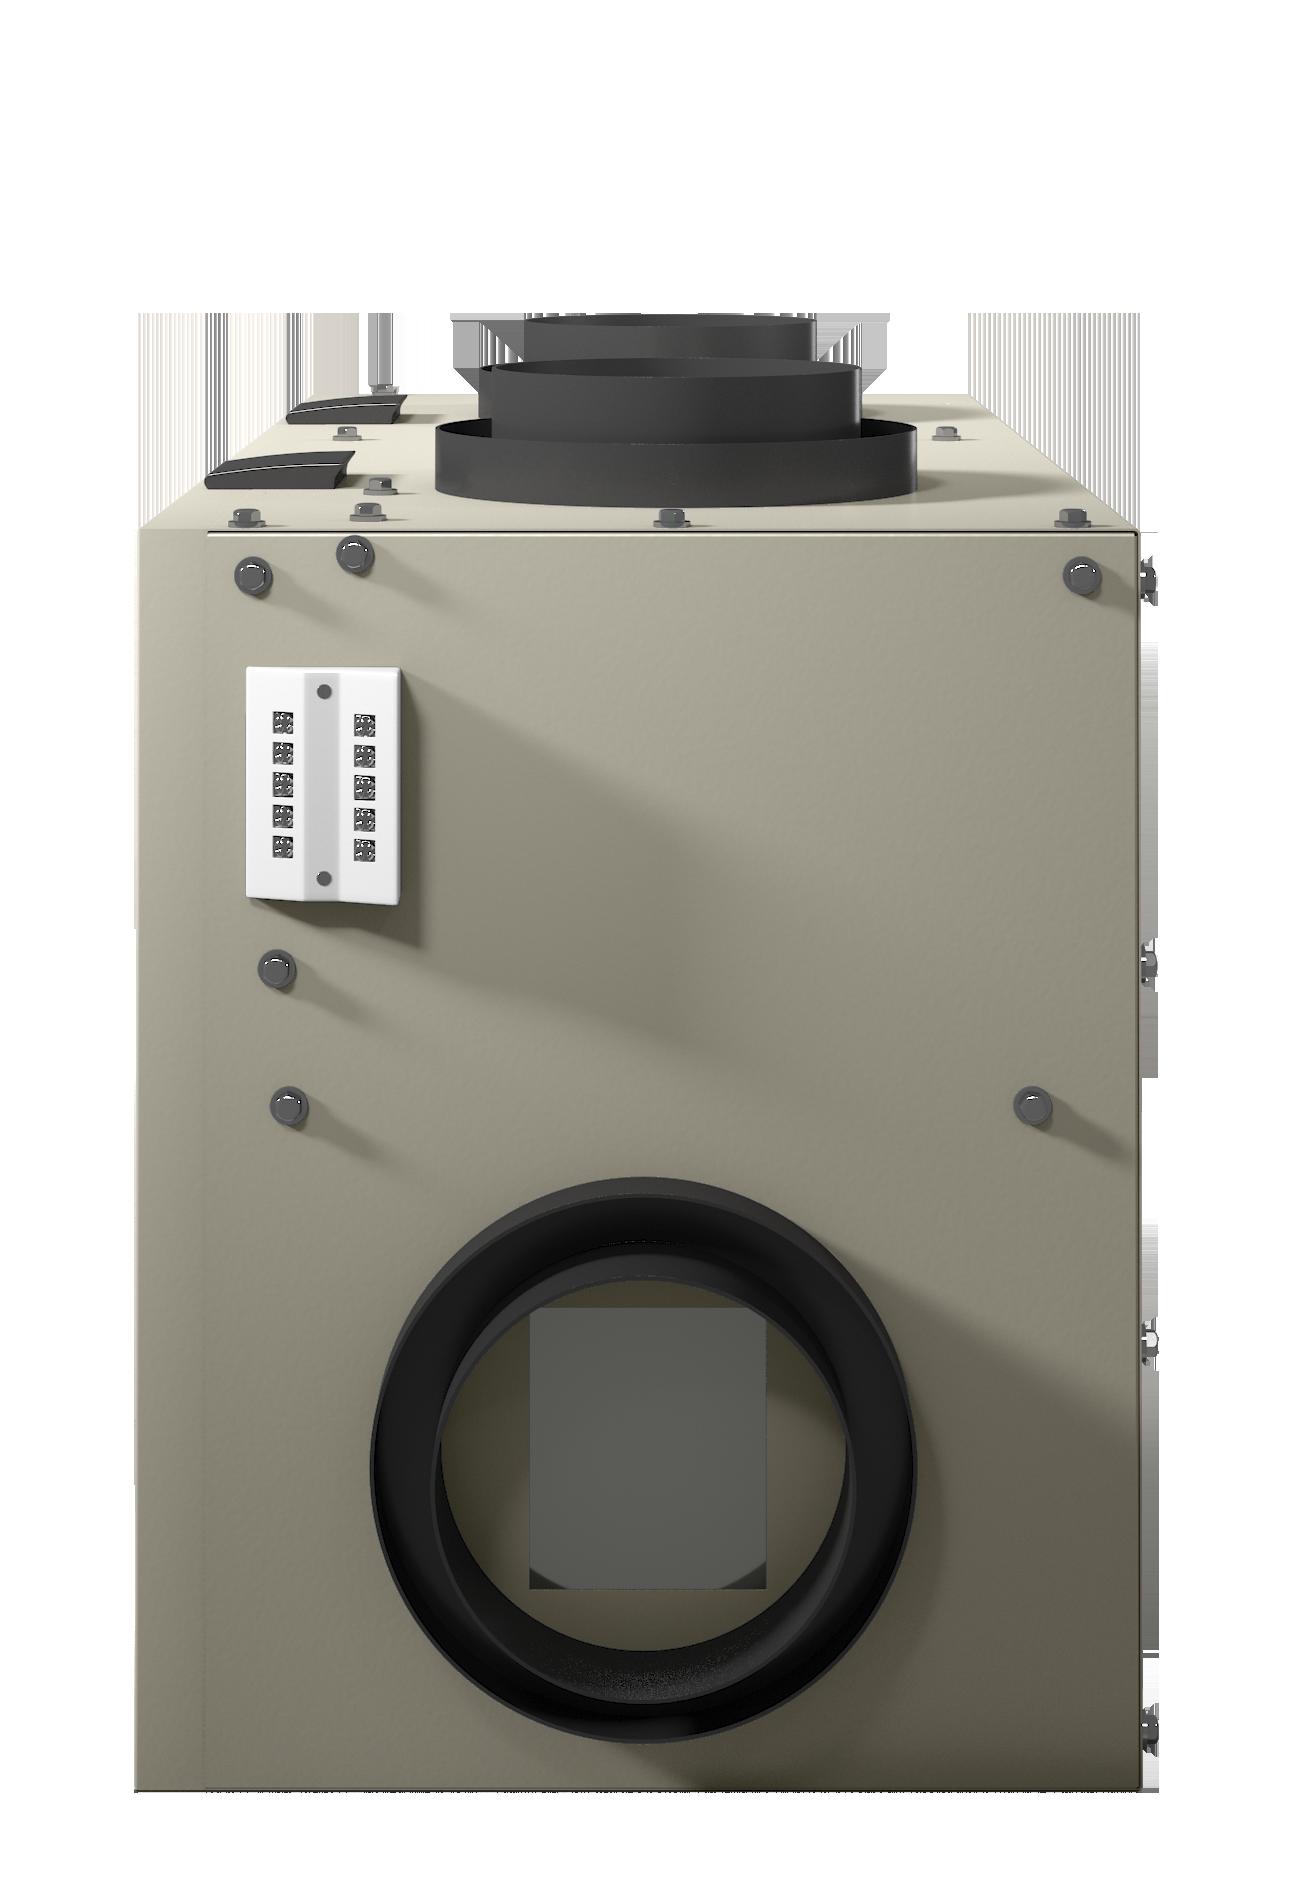 Lennox Ventilation System